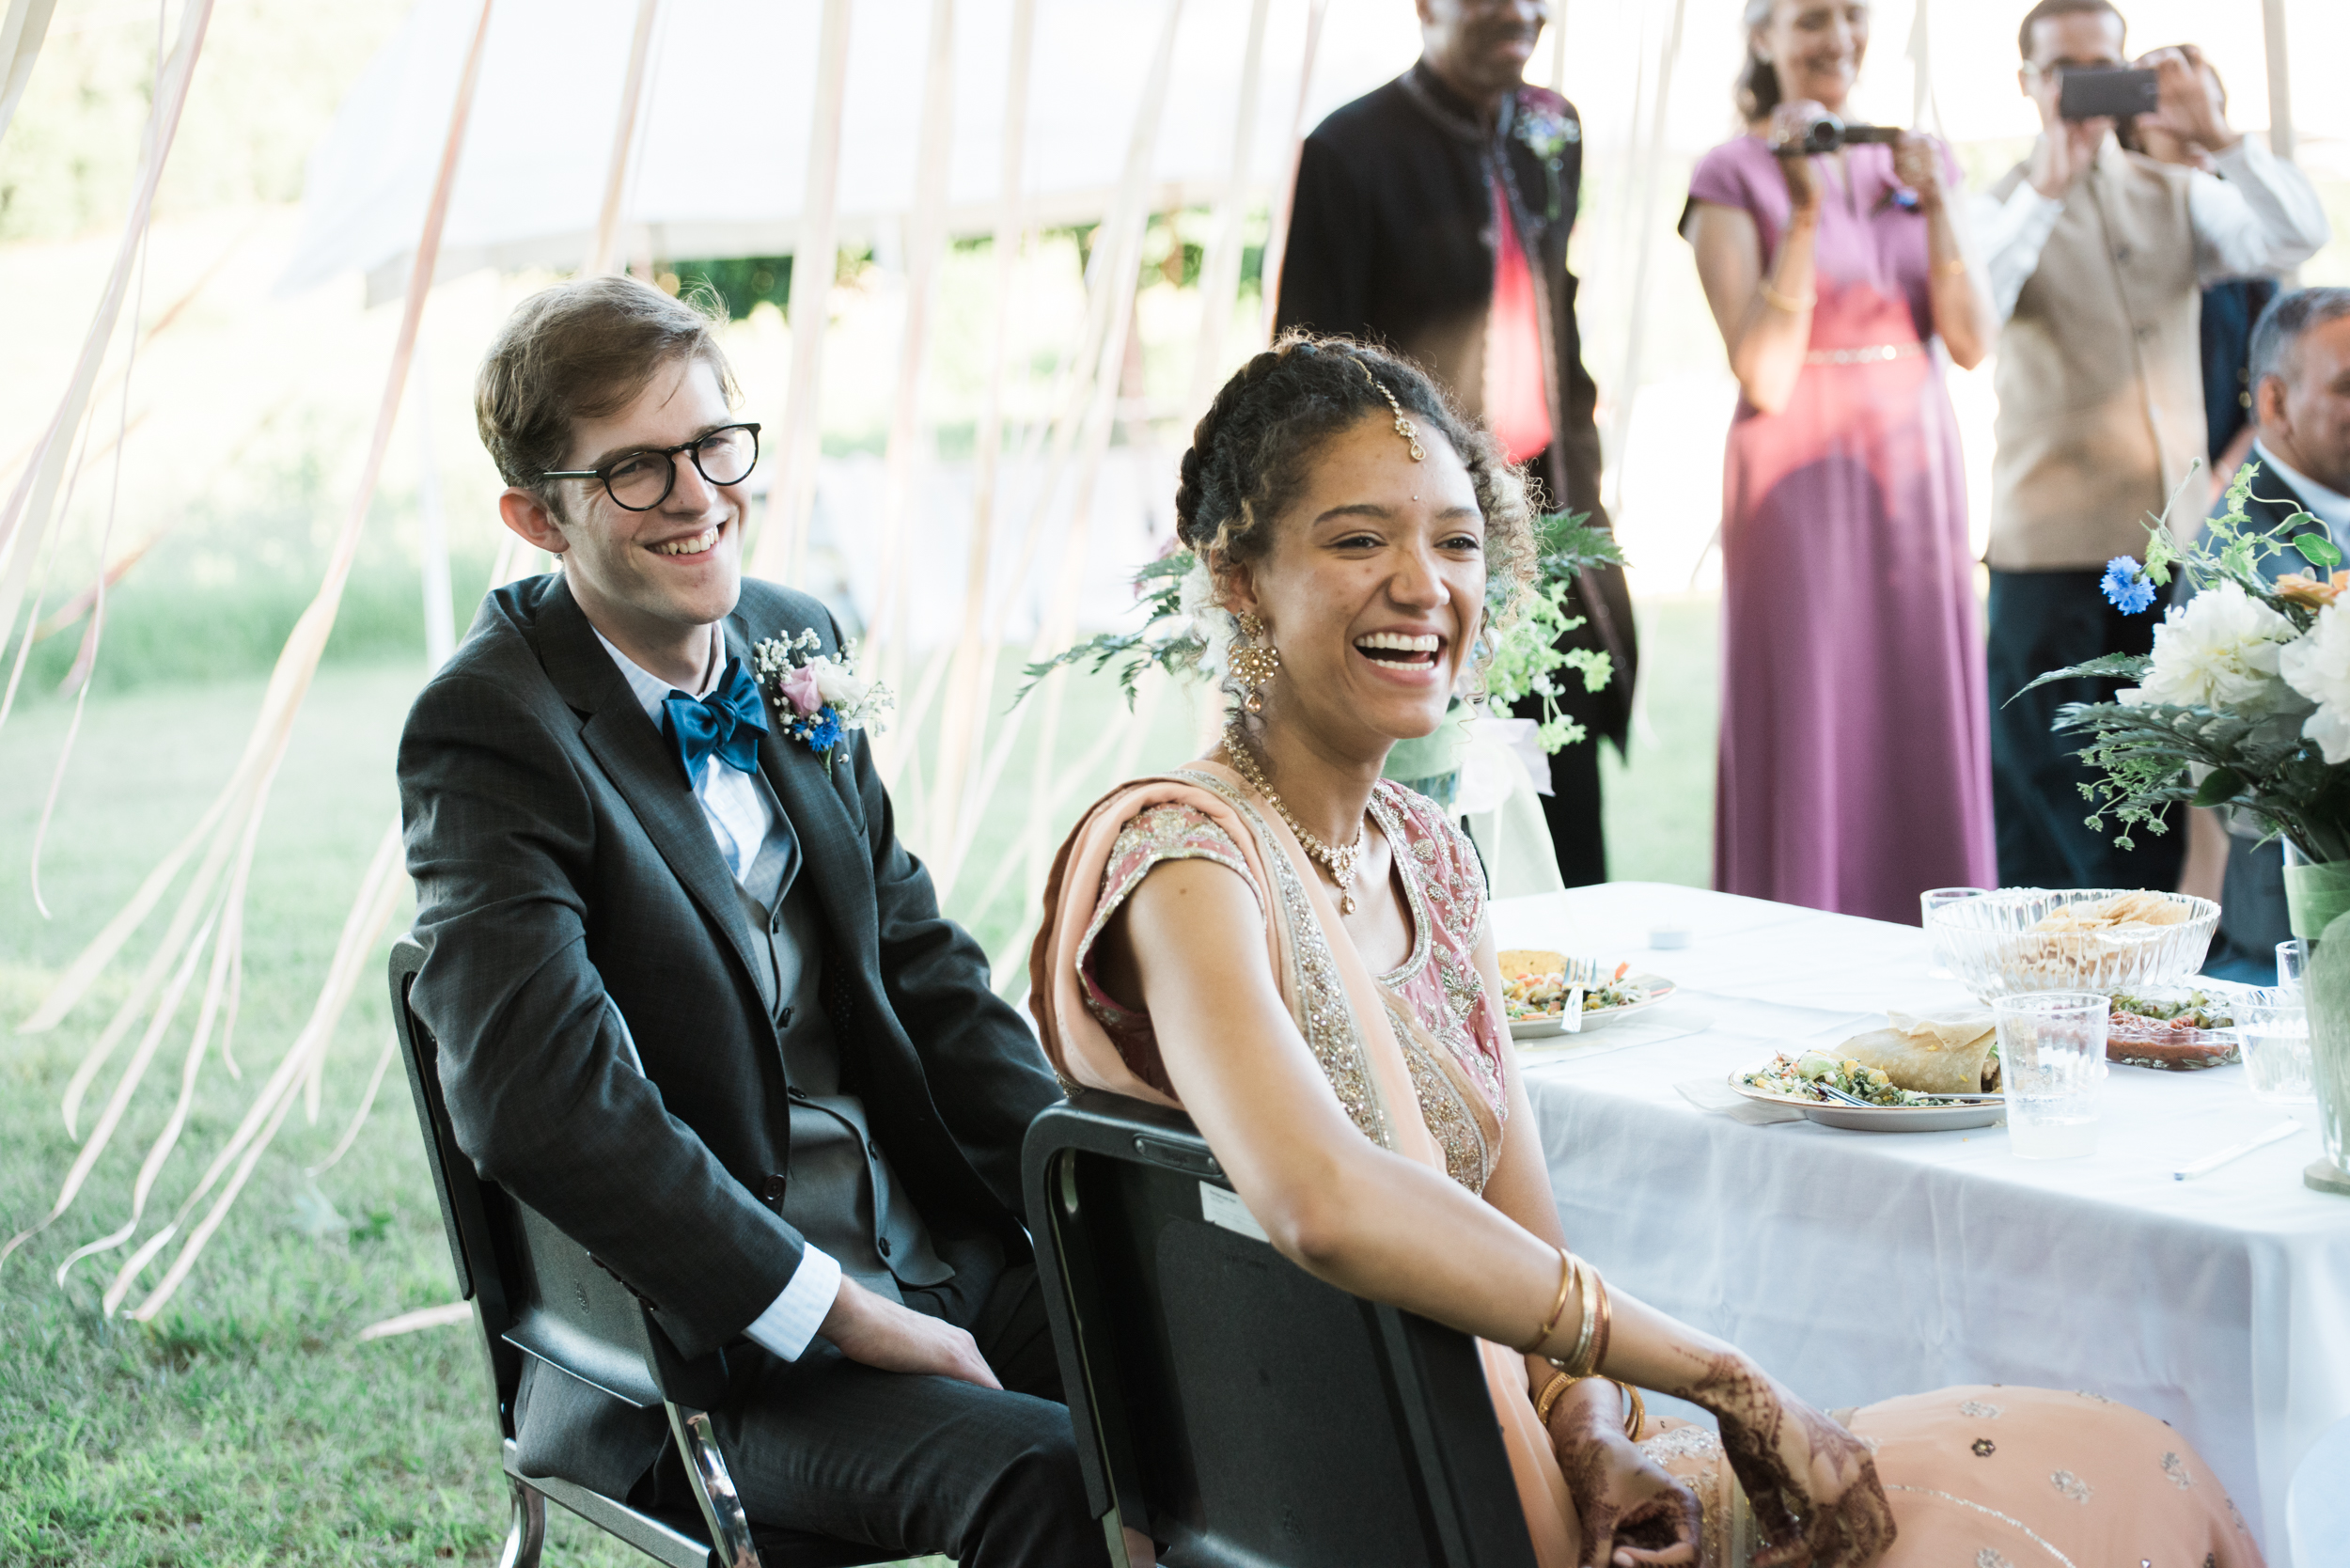 Outdoor Wedding in the Berkshires MA